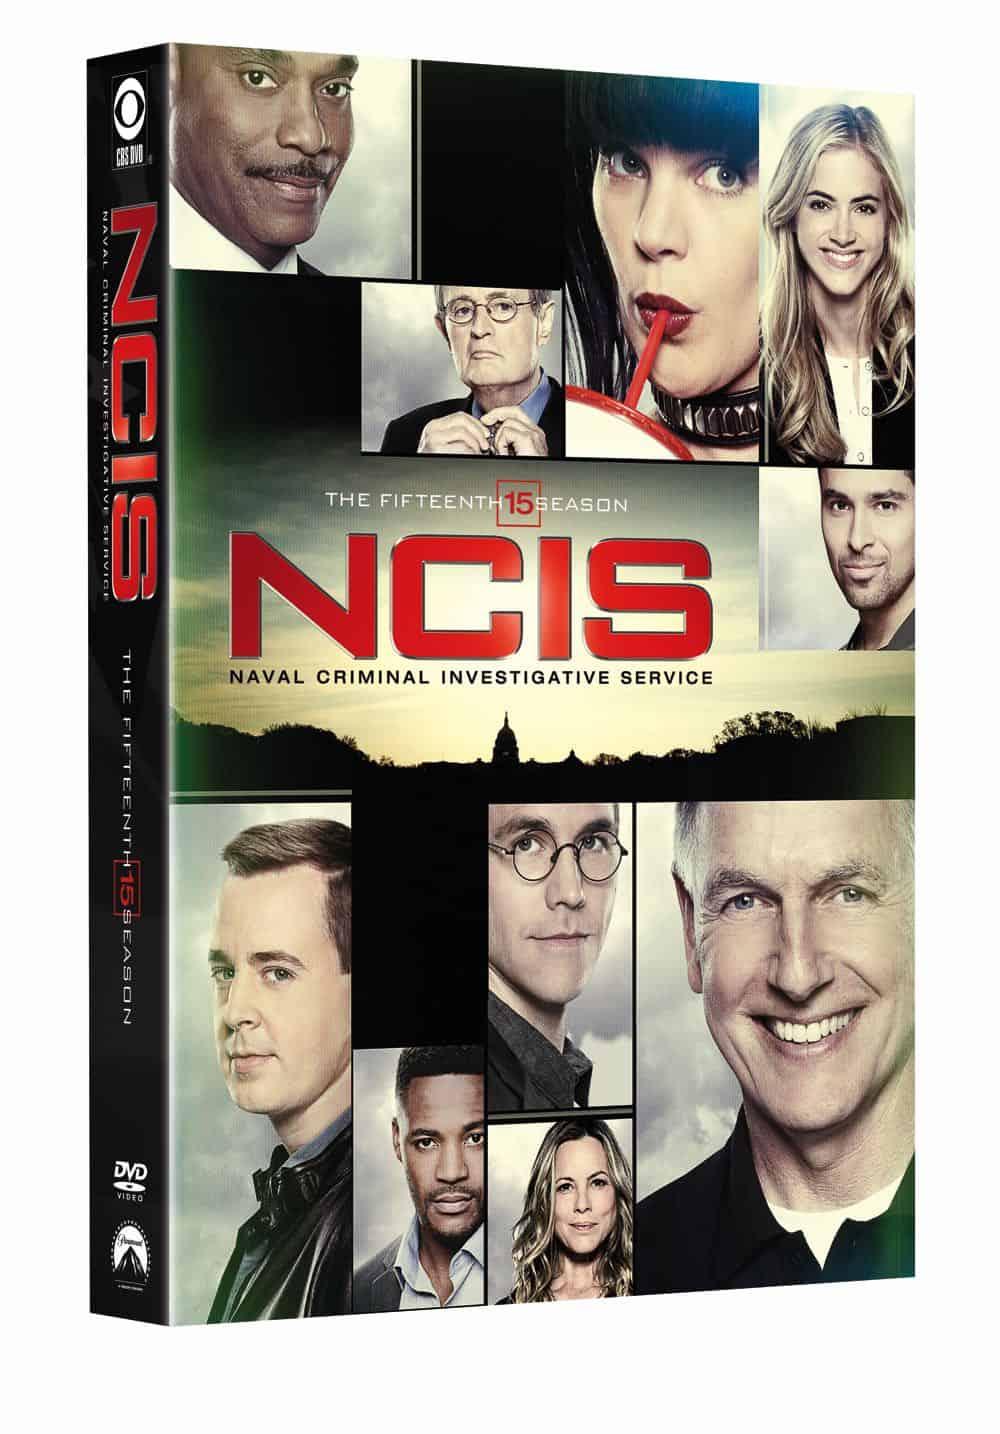 NCIS-Season-15-DVD-Cover-2